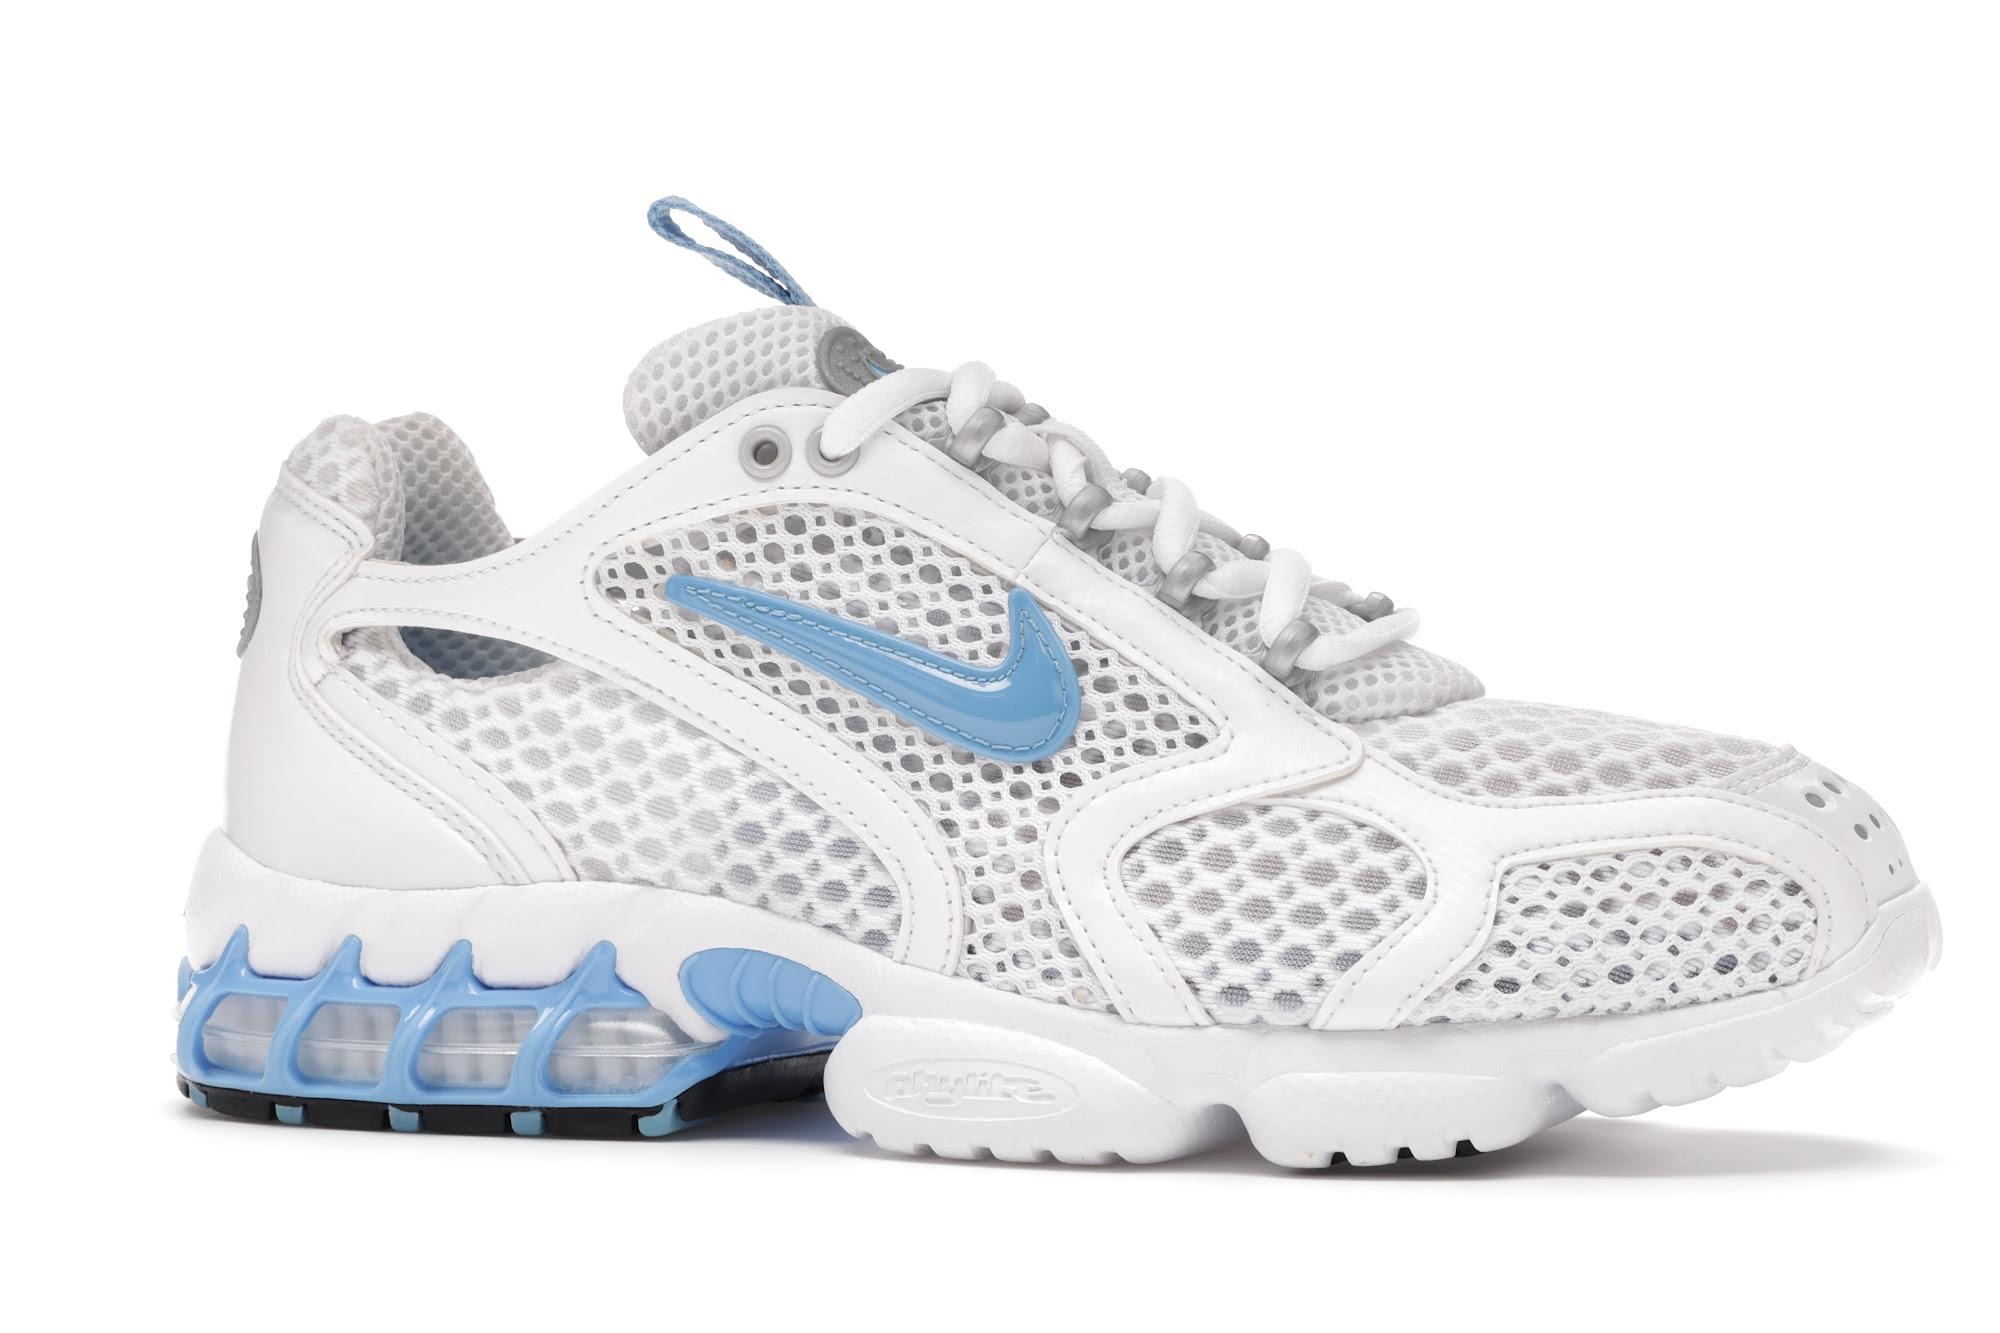 Nike Air Zoom Spiridon Cage 2 White University Blue (W)